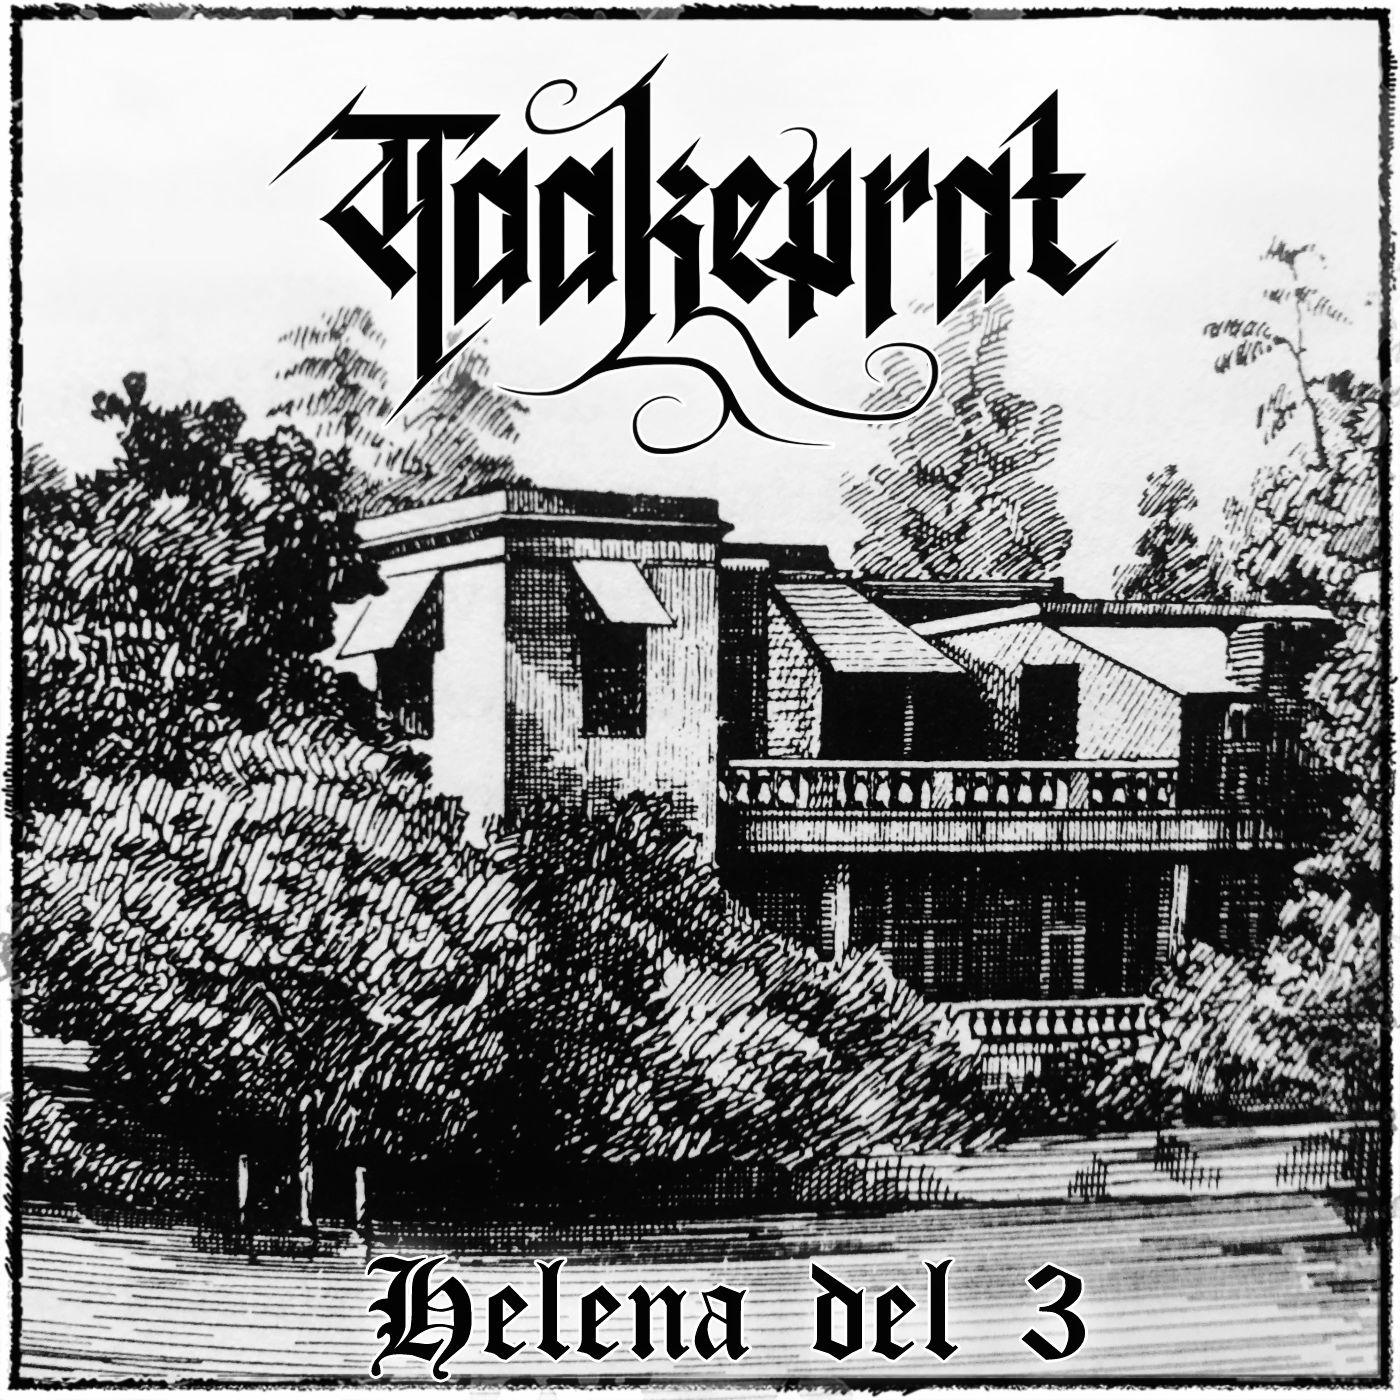 Episode 114 - Helena del 3